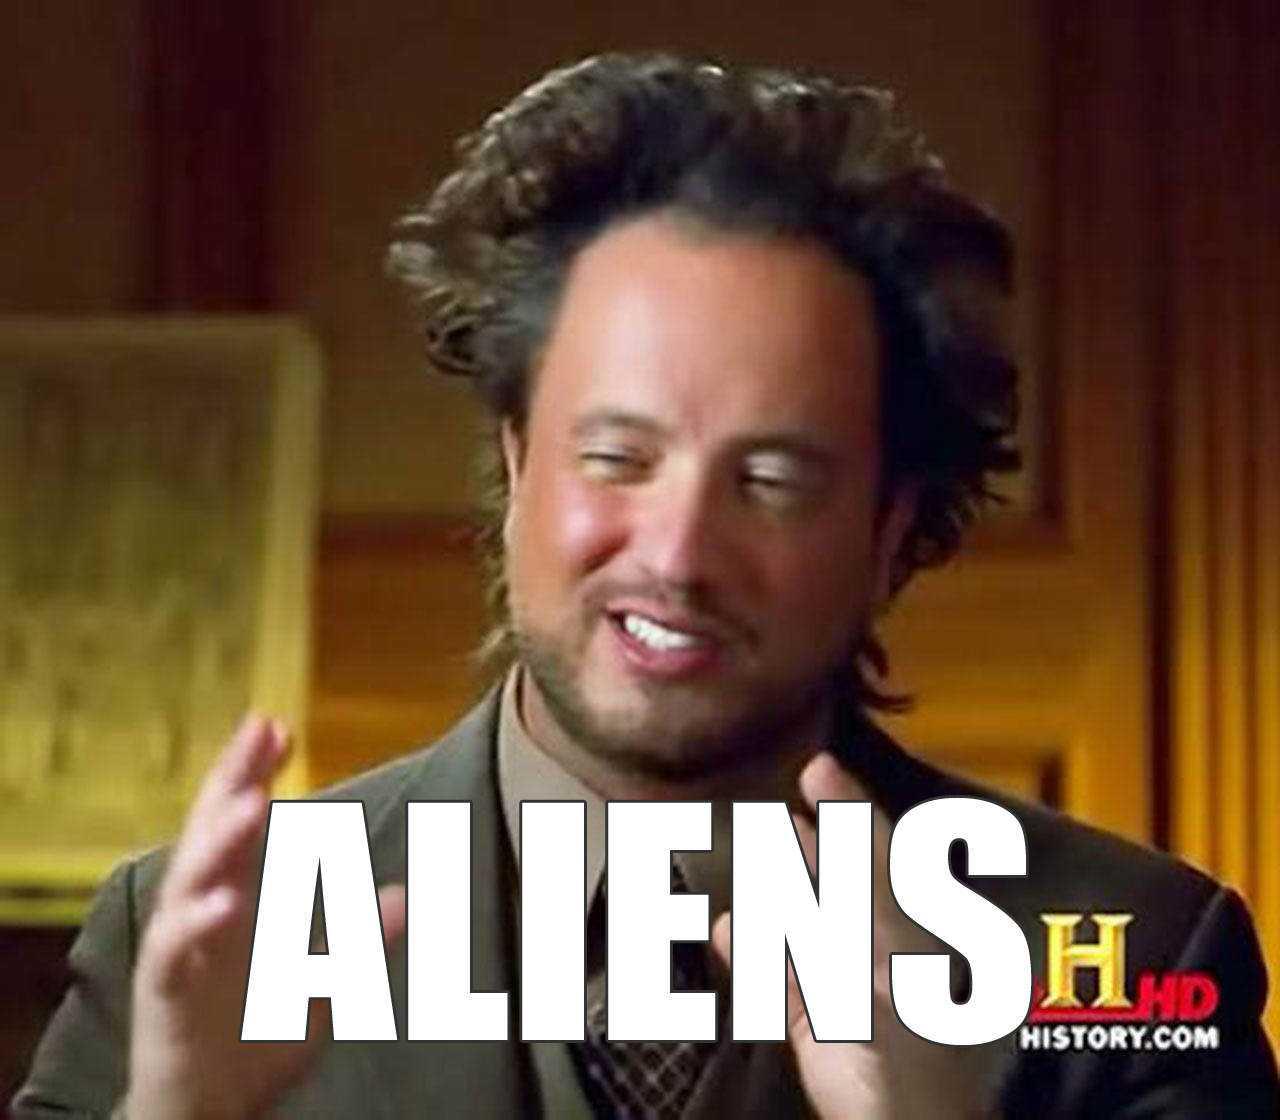 ancient aliens guy 1 Aliens e os paredões de pedra misteriosos dos templos Incas